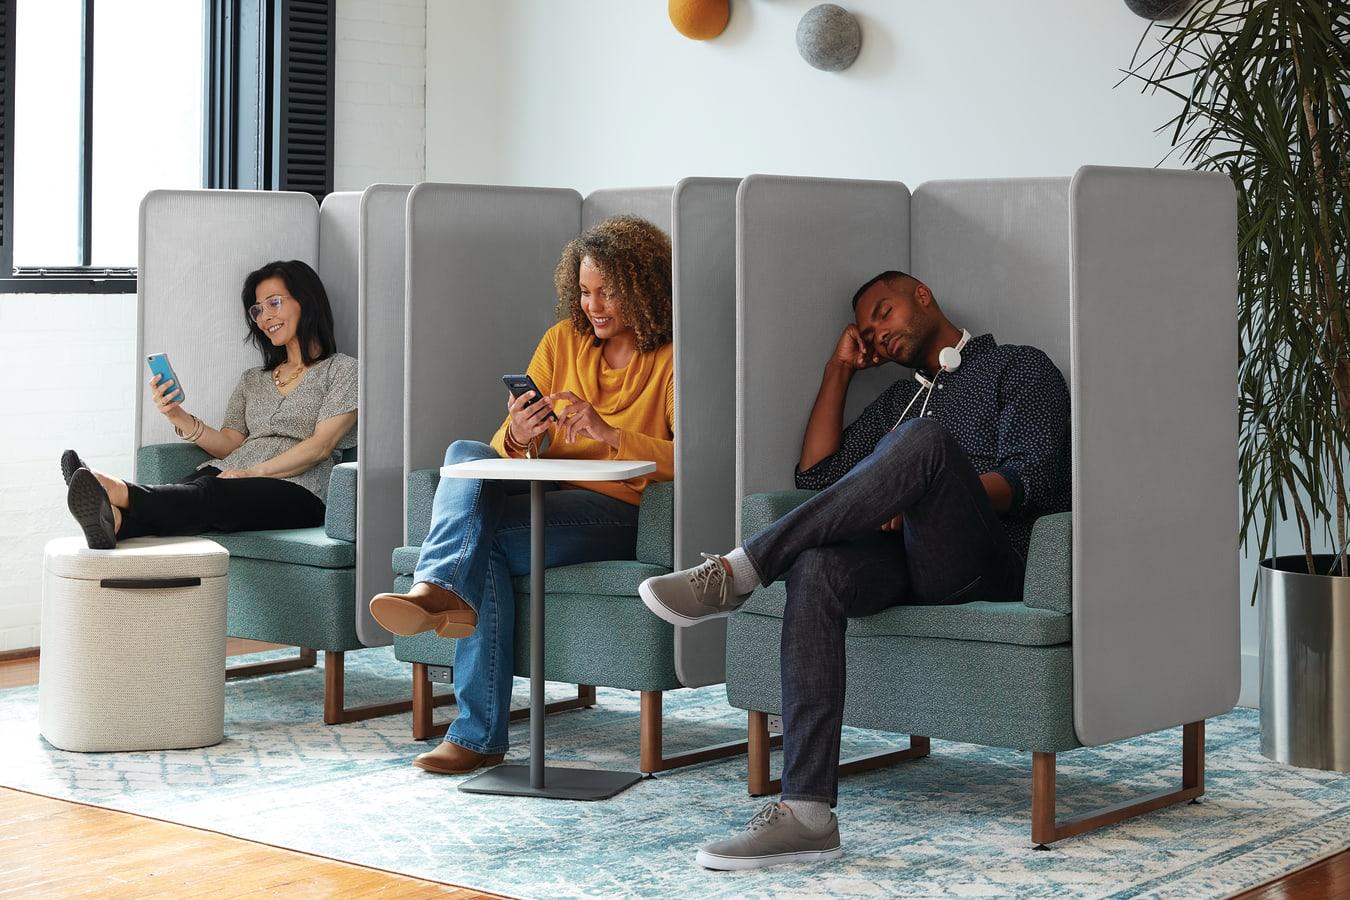 HON/Chairs/Astir/HON-Astir-Birk-500-010